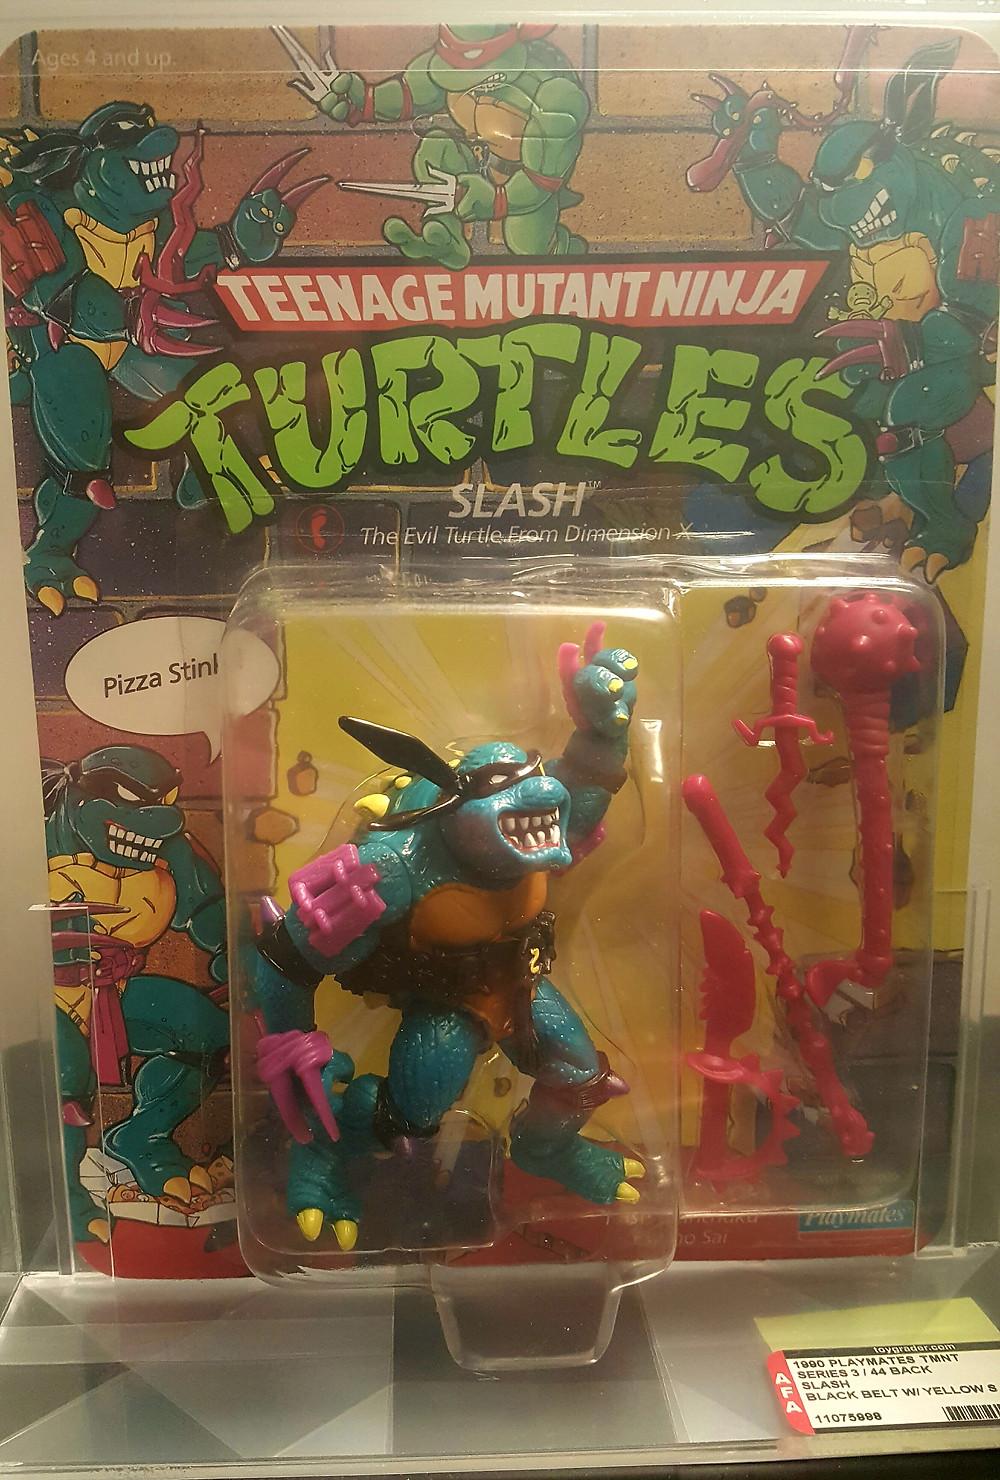 TMNT variations Http://www.valleygoto.com